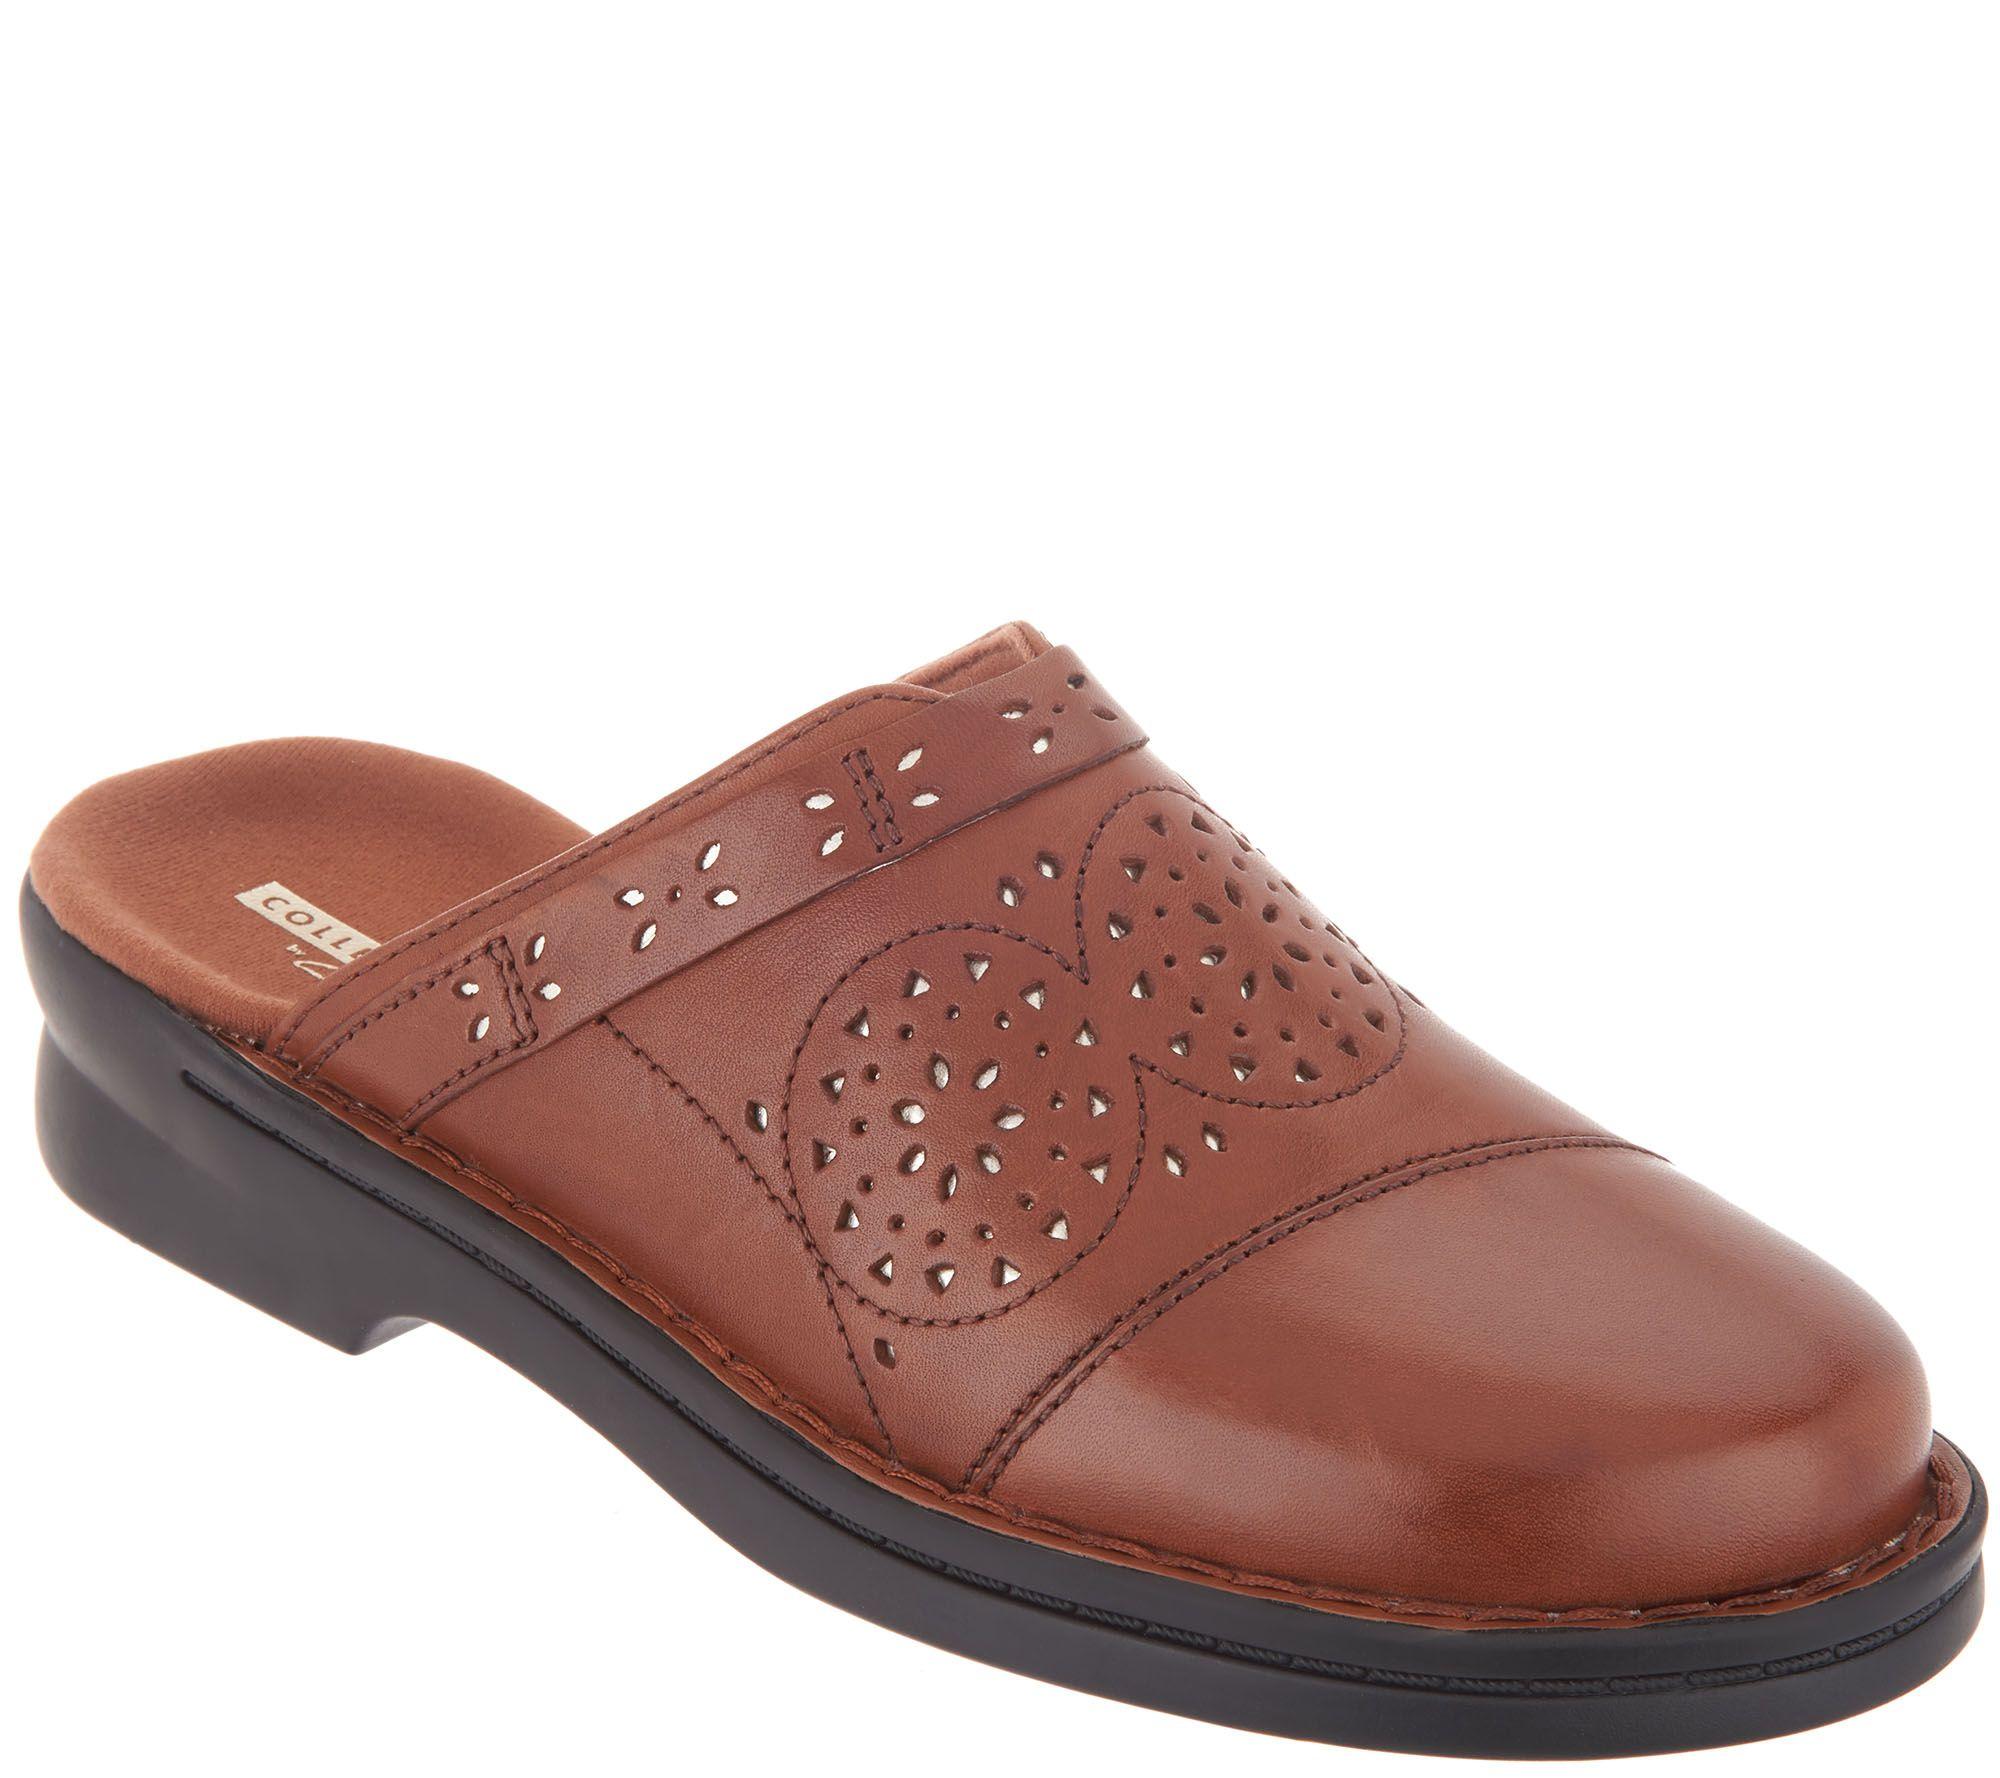 4ce72847df30f Clarks Collecton Leather Clogs - Patty Renata — QVC.com